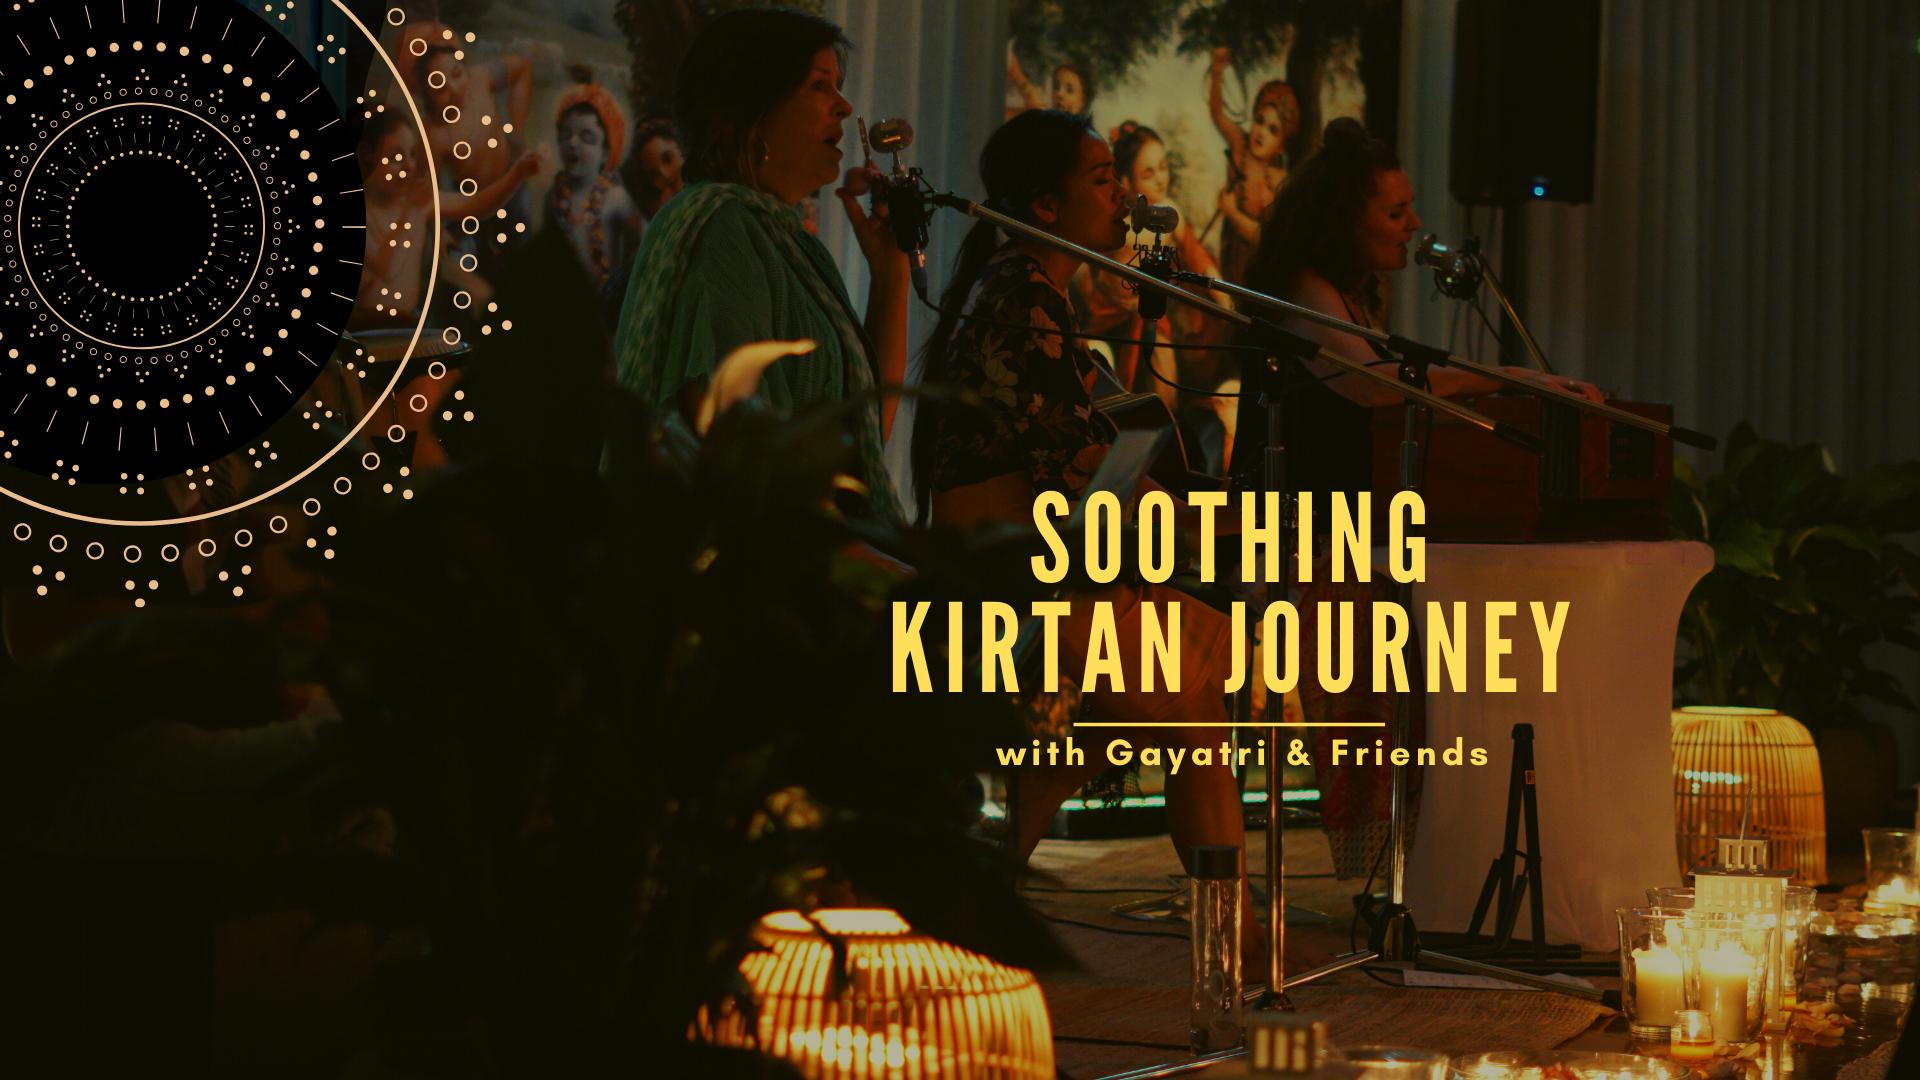 Soothing Kirtan Journey